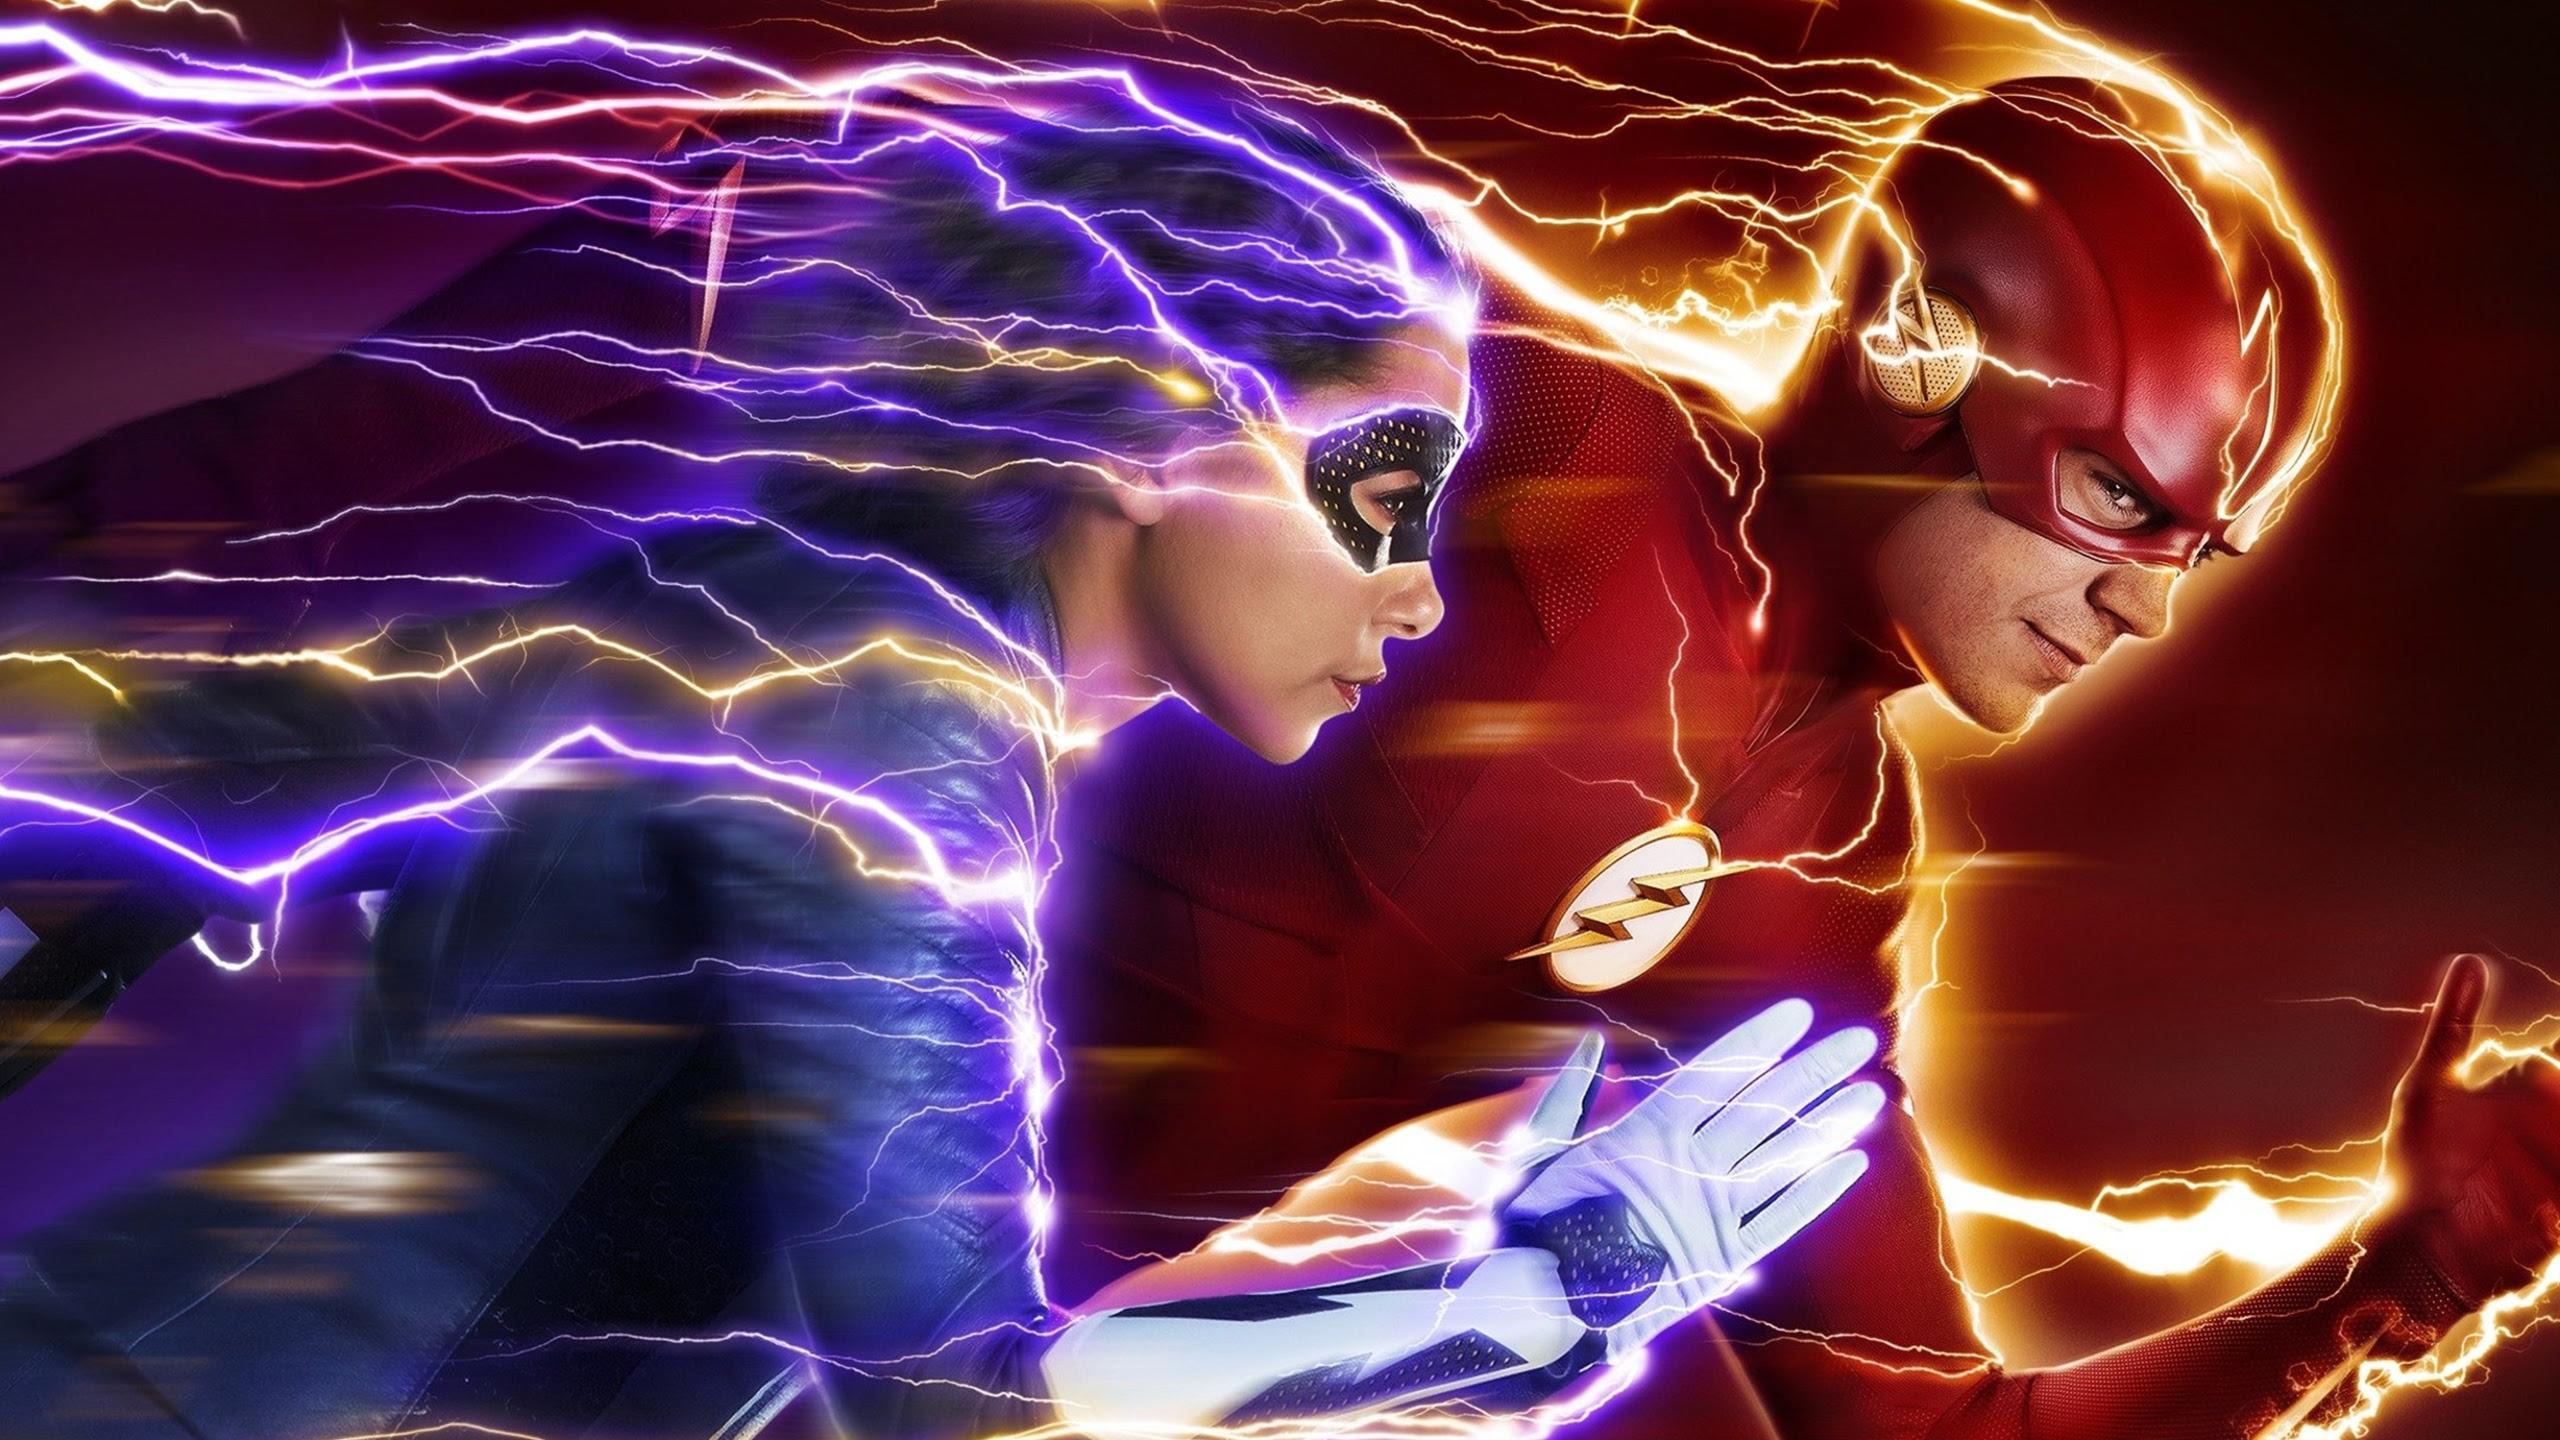 The Flash Nora Season 5 Wallpapers Hd Wallpapers